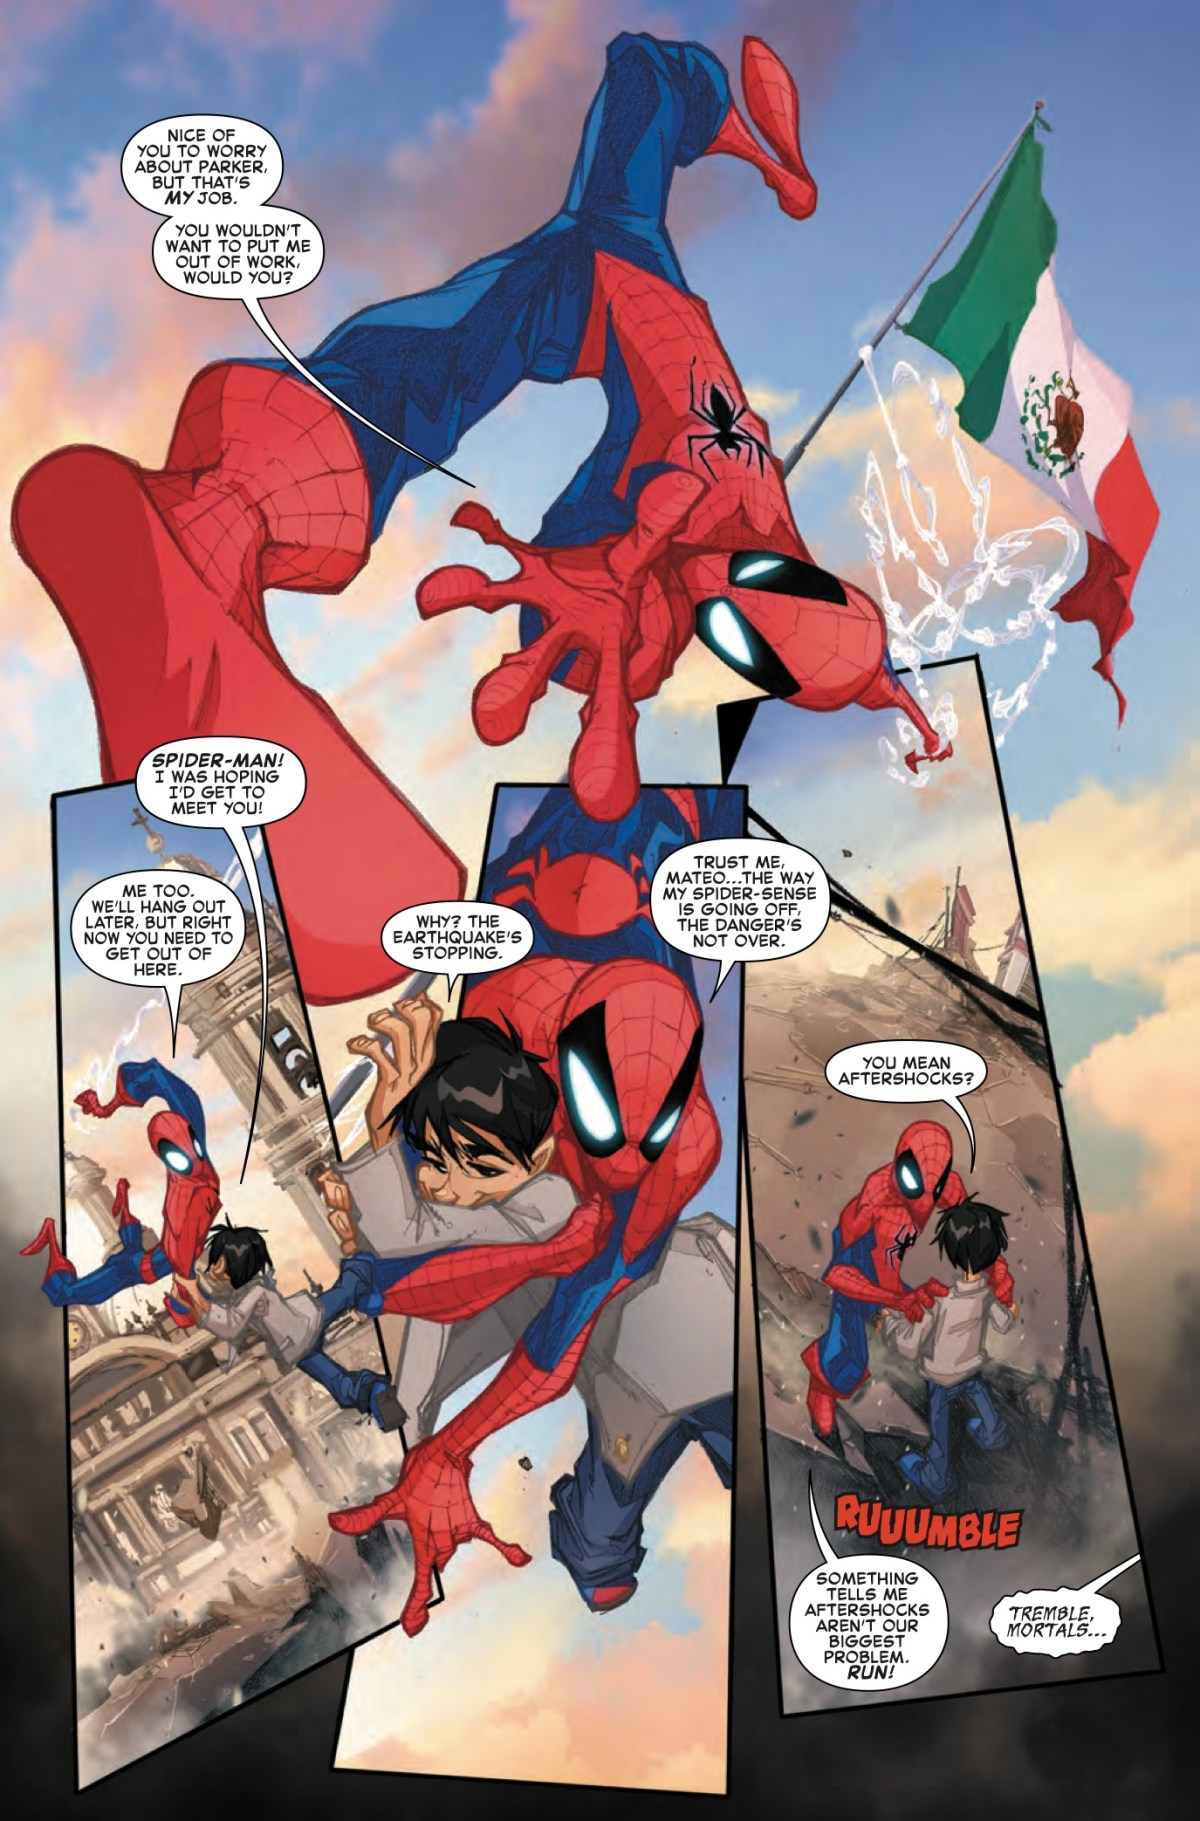 Amazing Spider-Man: Worldwide Vol. 5 Review